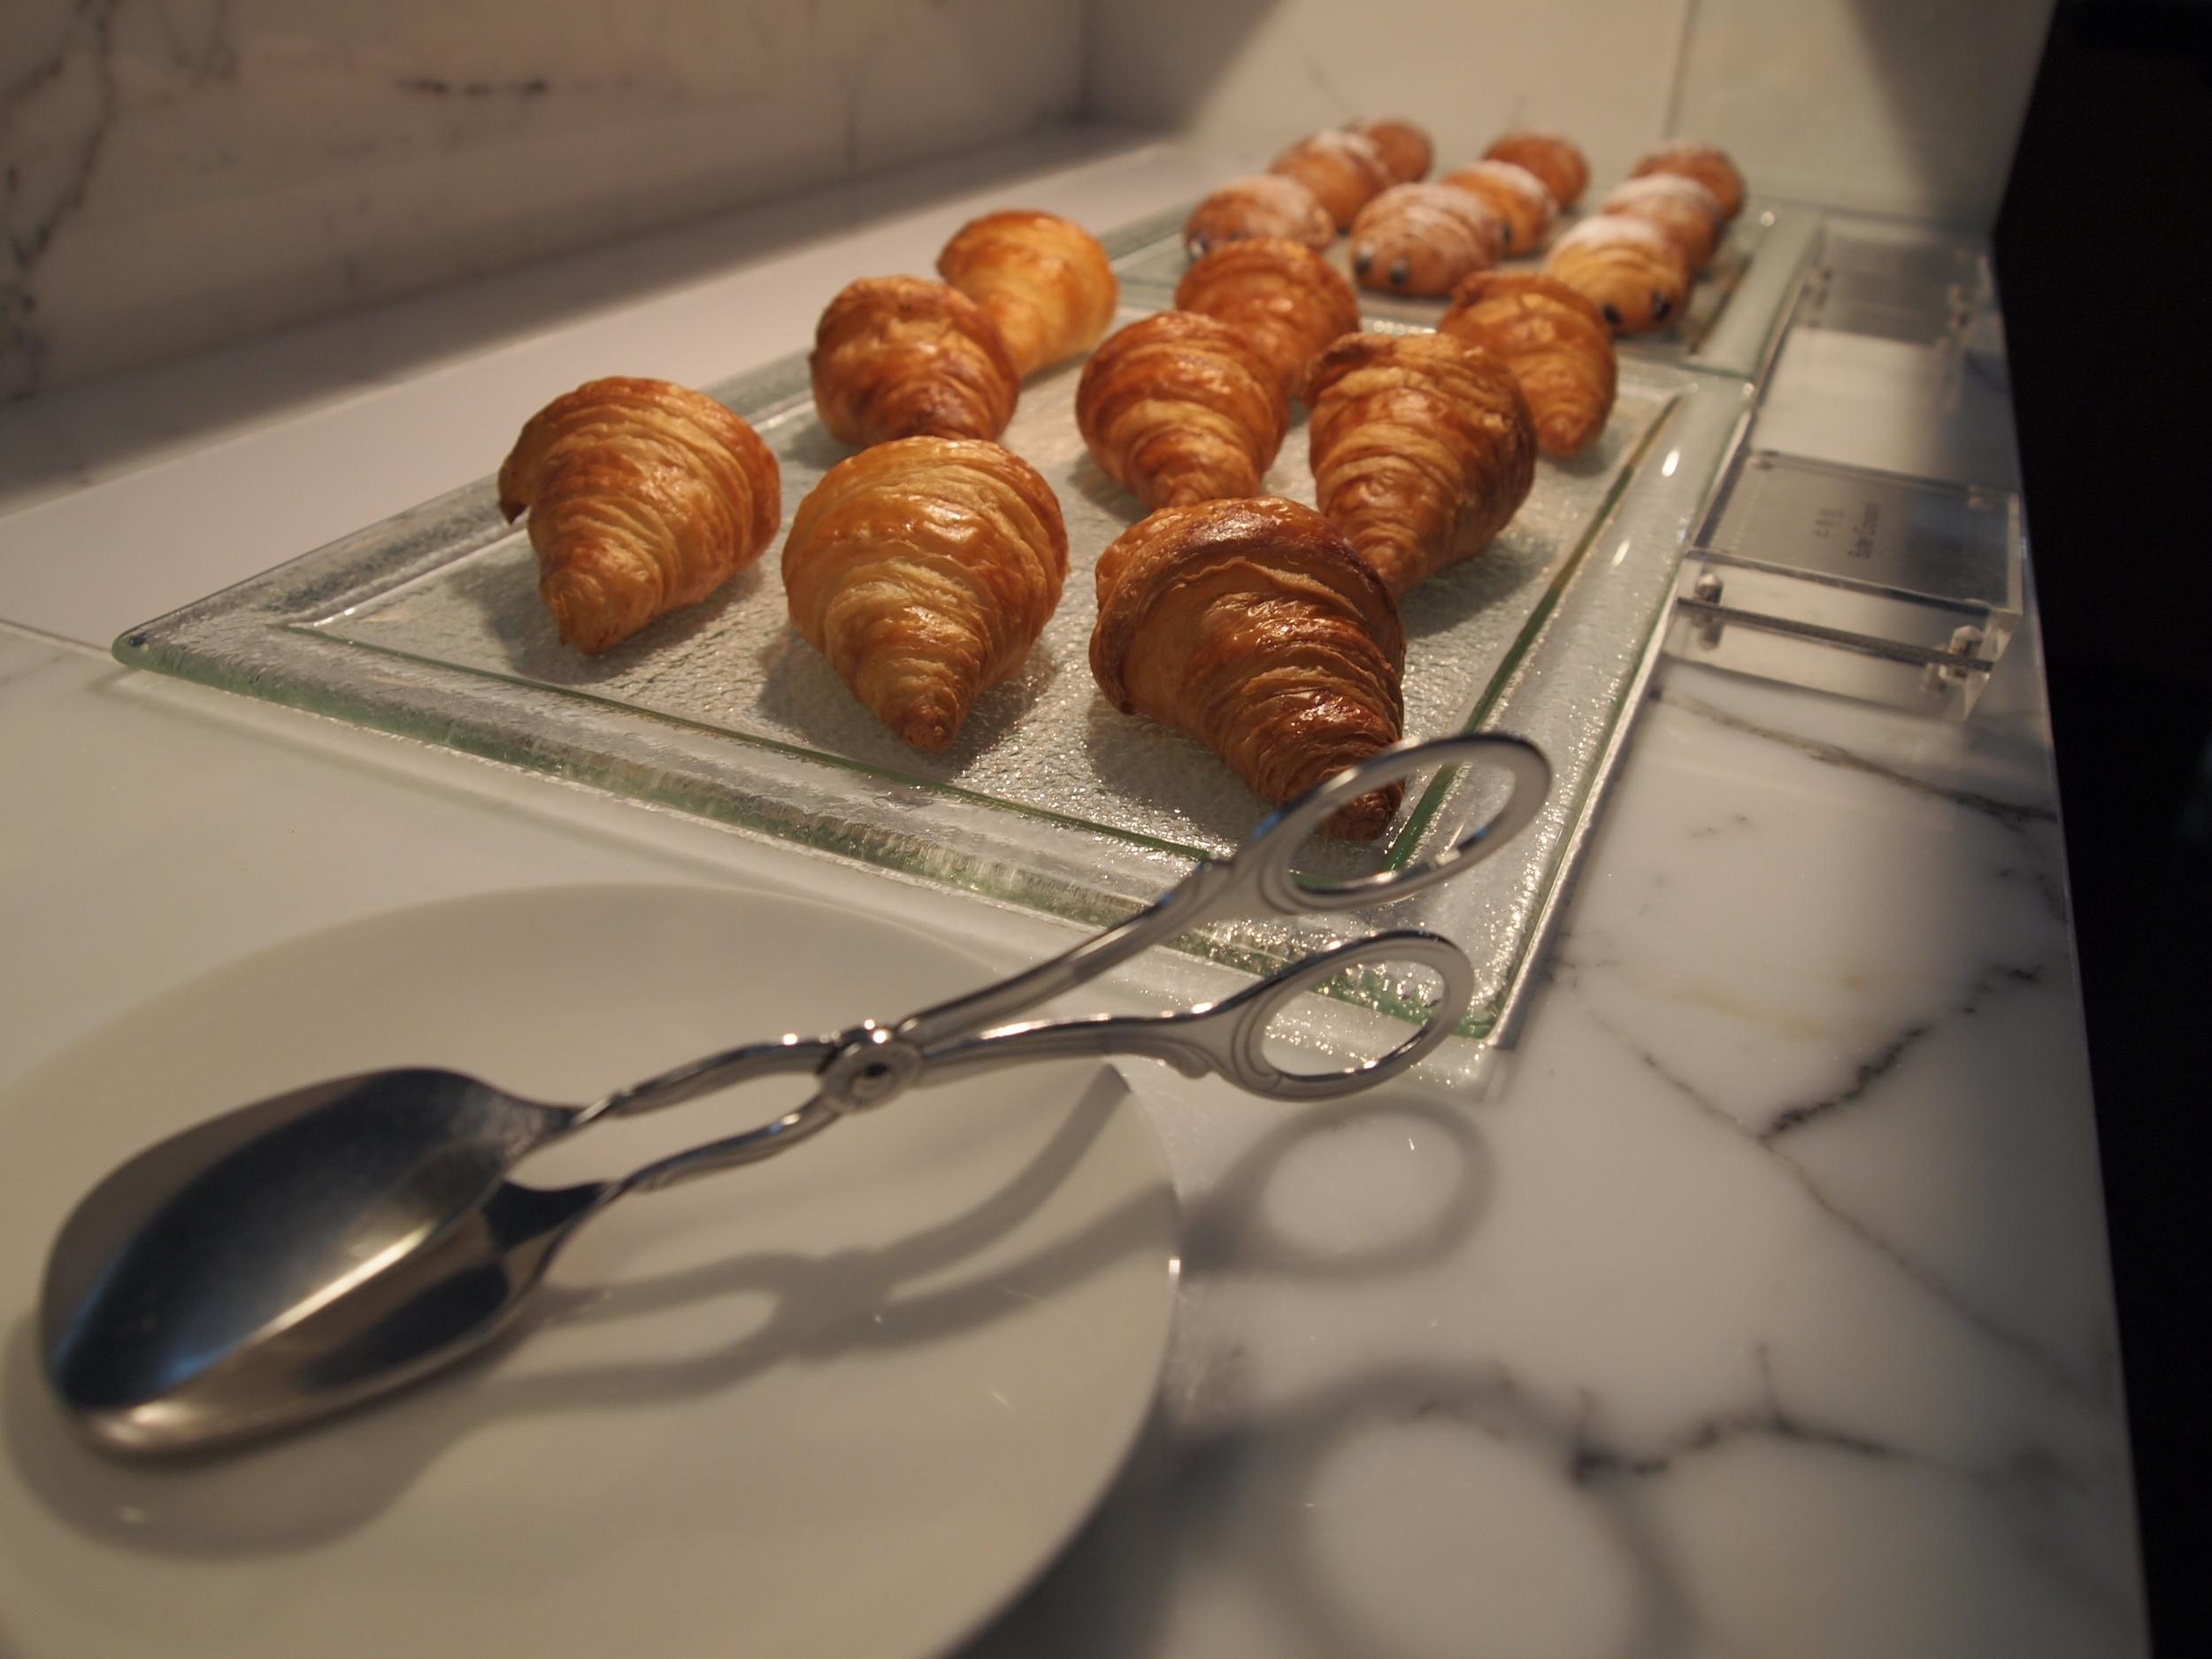 The Long Bar morning croissants